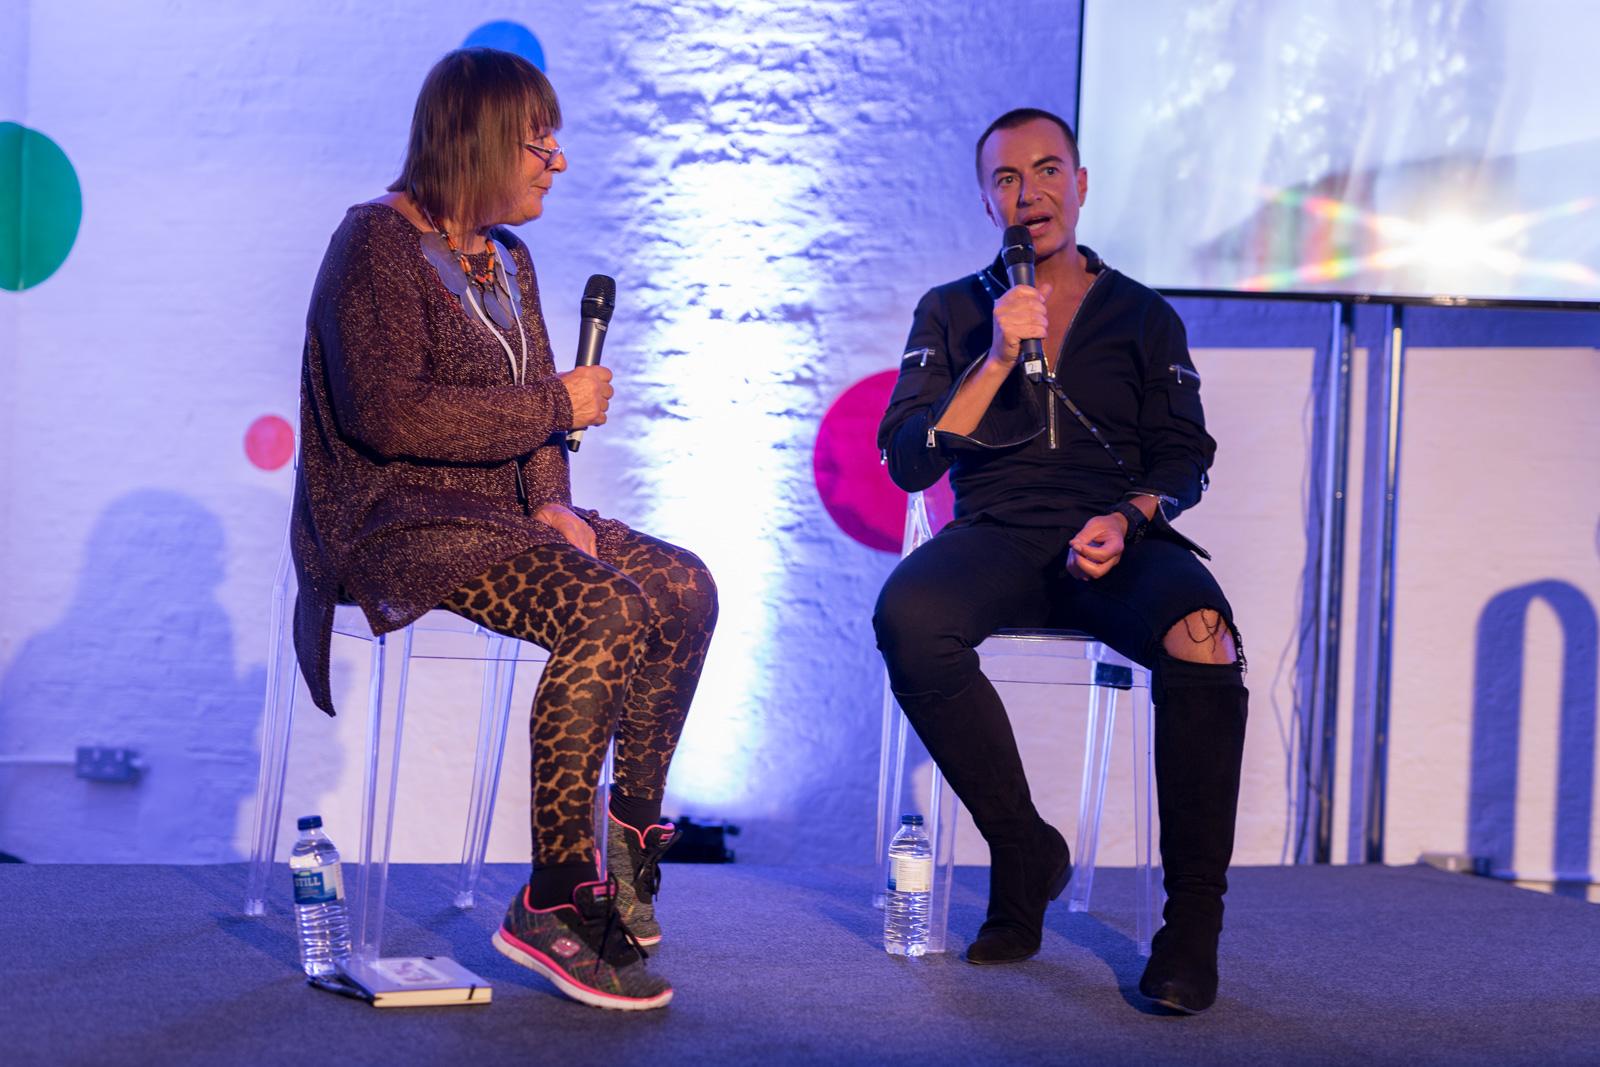 (Julien Macdonald in conversation with Hilary Alexander OBE The career of the King of Glamour by Debenhams) (Debenhams)  (06-06-2017) (image by Qavi Reyez)_-2.jpg